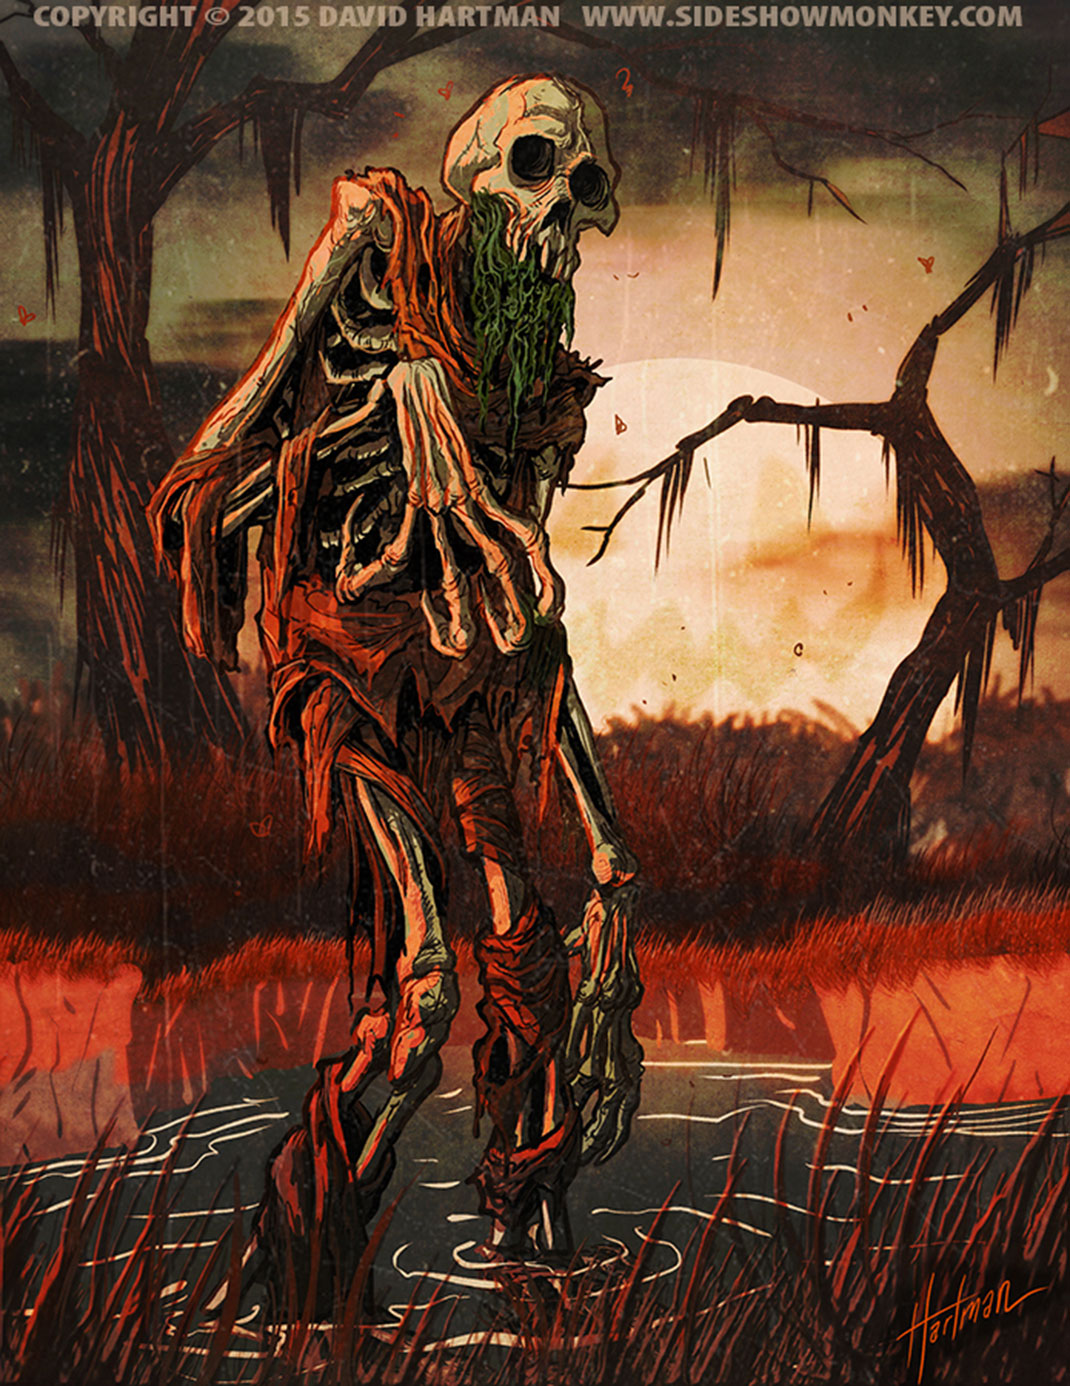 mud_zombie_by_hartman_by_sideshowmonkey-d99svei